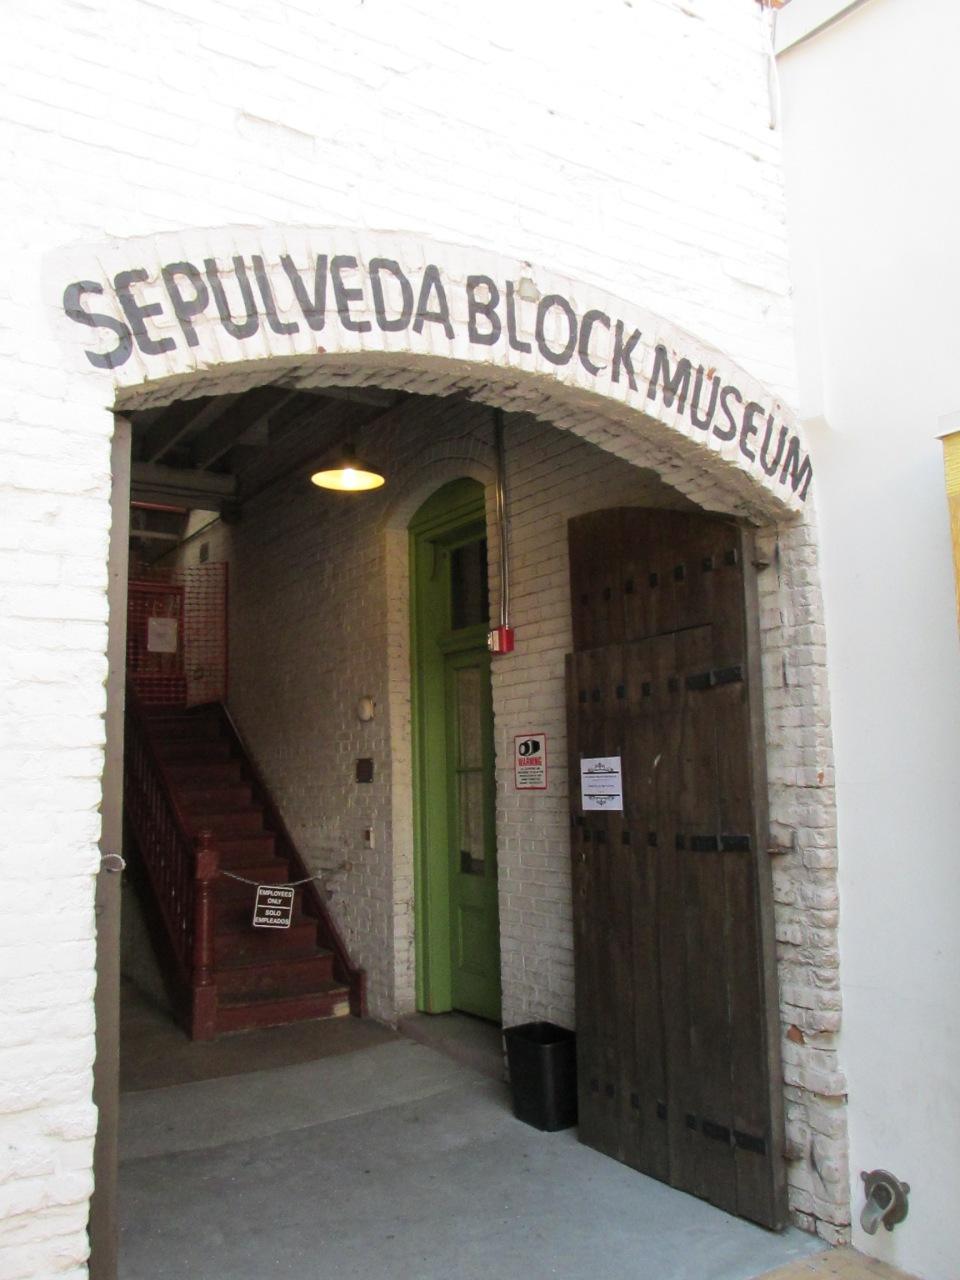 The Sepulveda House.  One of the notable historic buidings of Olvera Street. http://en.wikipedia.org/wiki/El_Pueblo_de_Los_%C3%81ngeles_Historical_Monument#Sepulveda_House